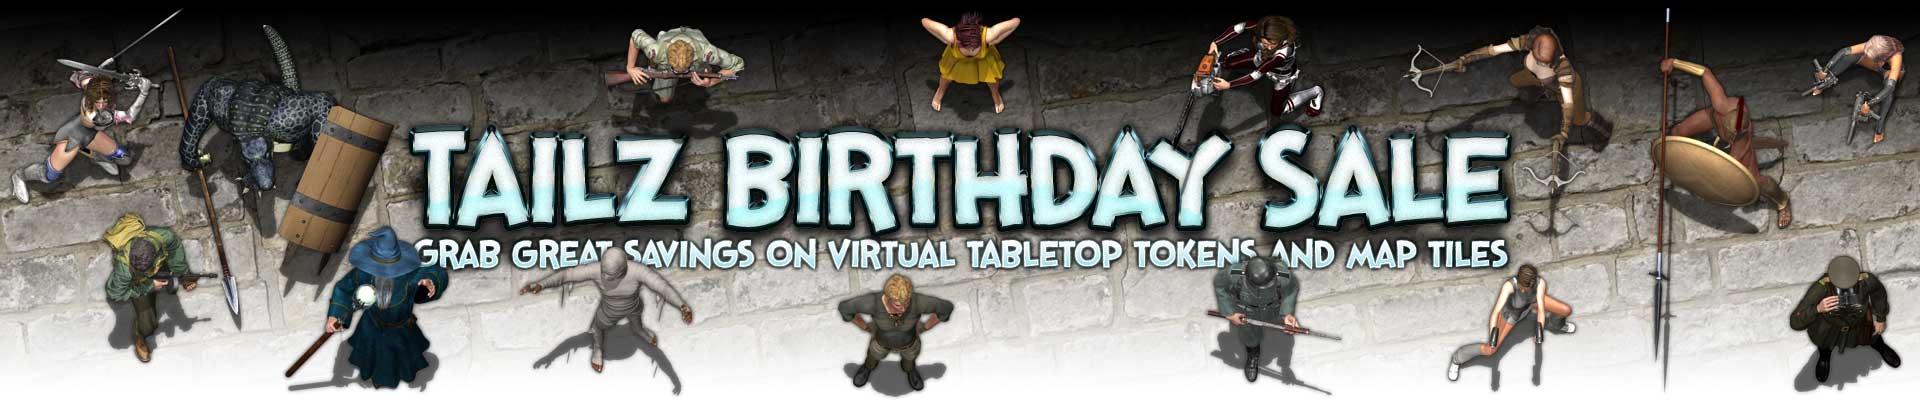 Tailz Birthday Sale